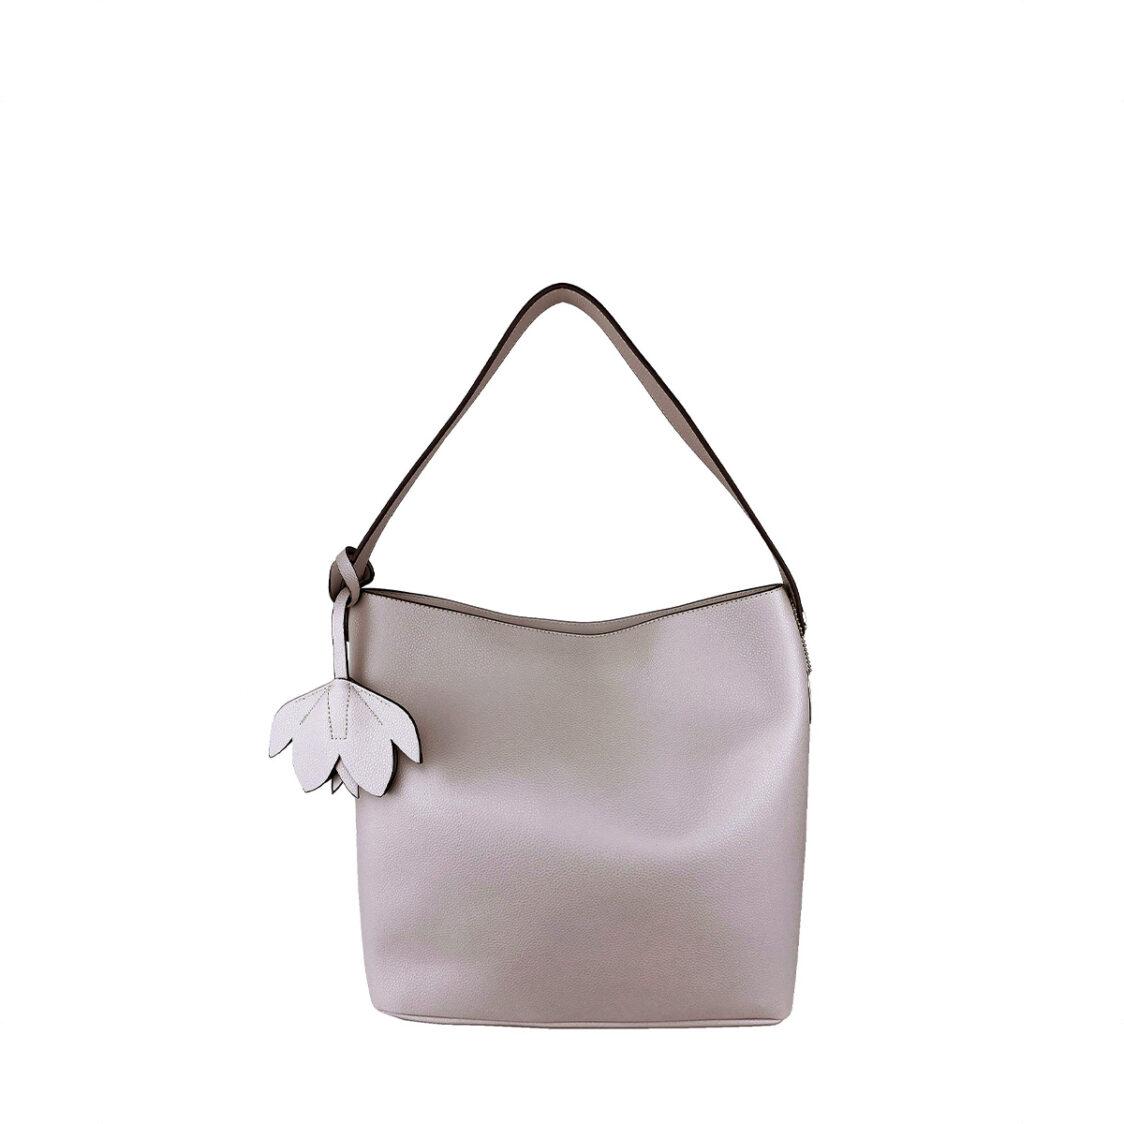 Perllini  Mel Single Handle Shoulder Bag Cream PY9923-Crea